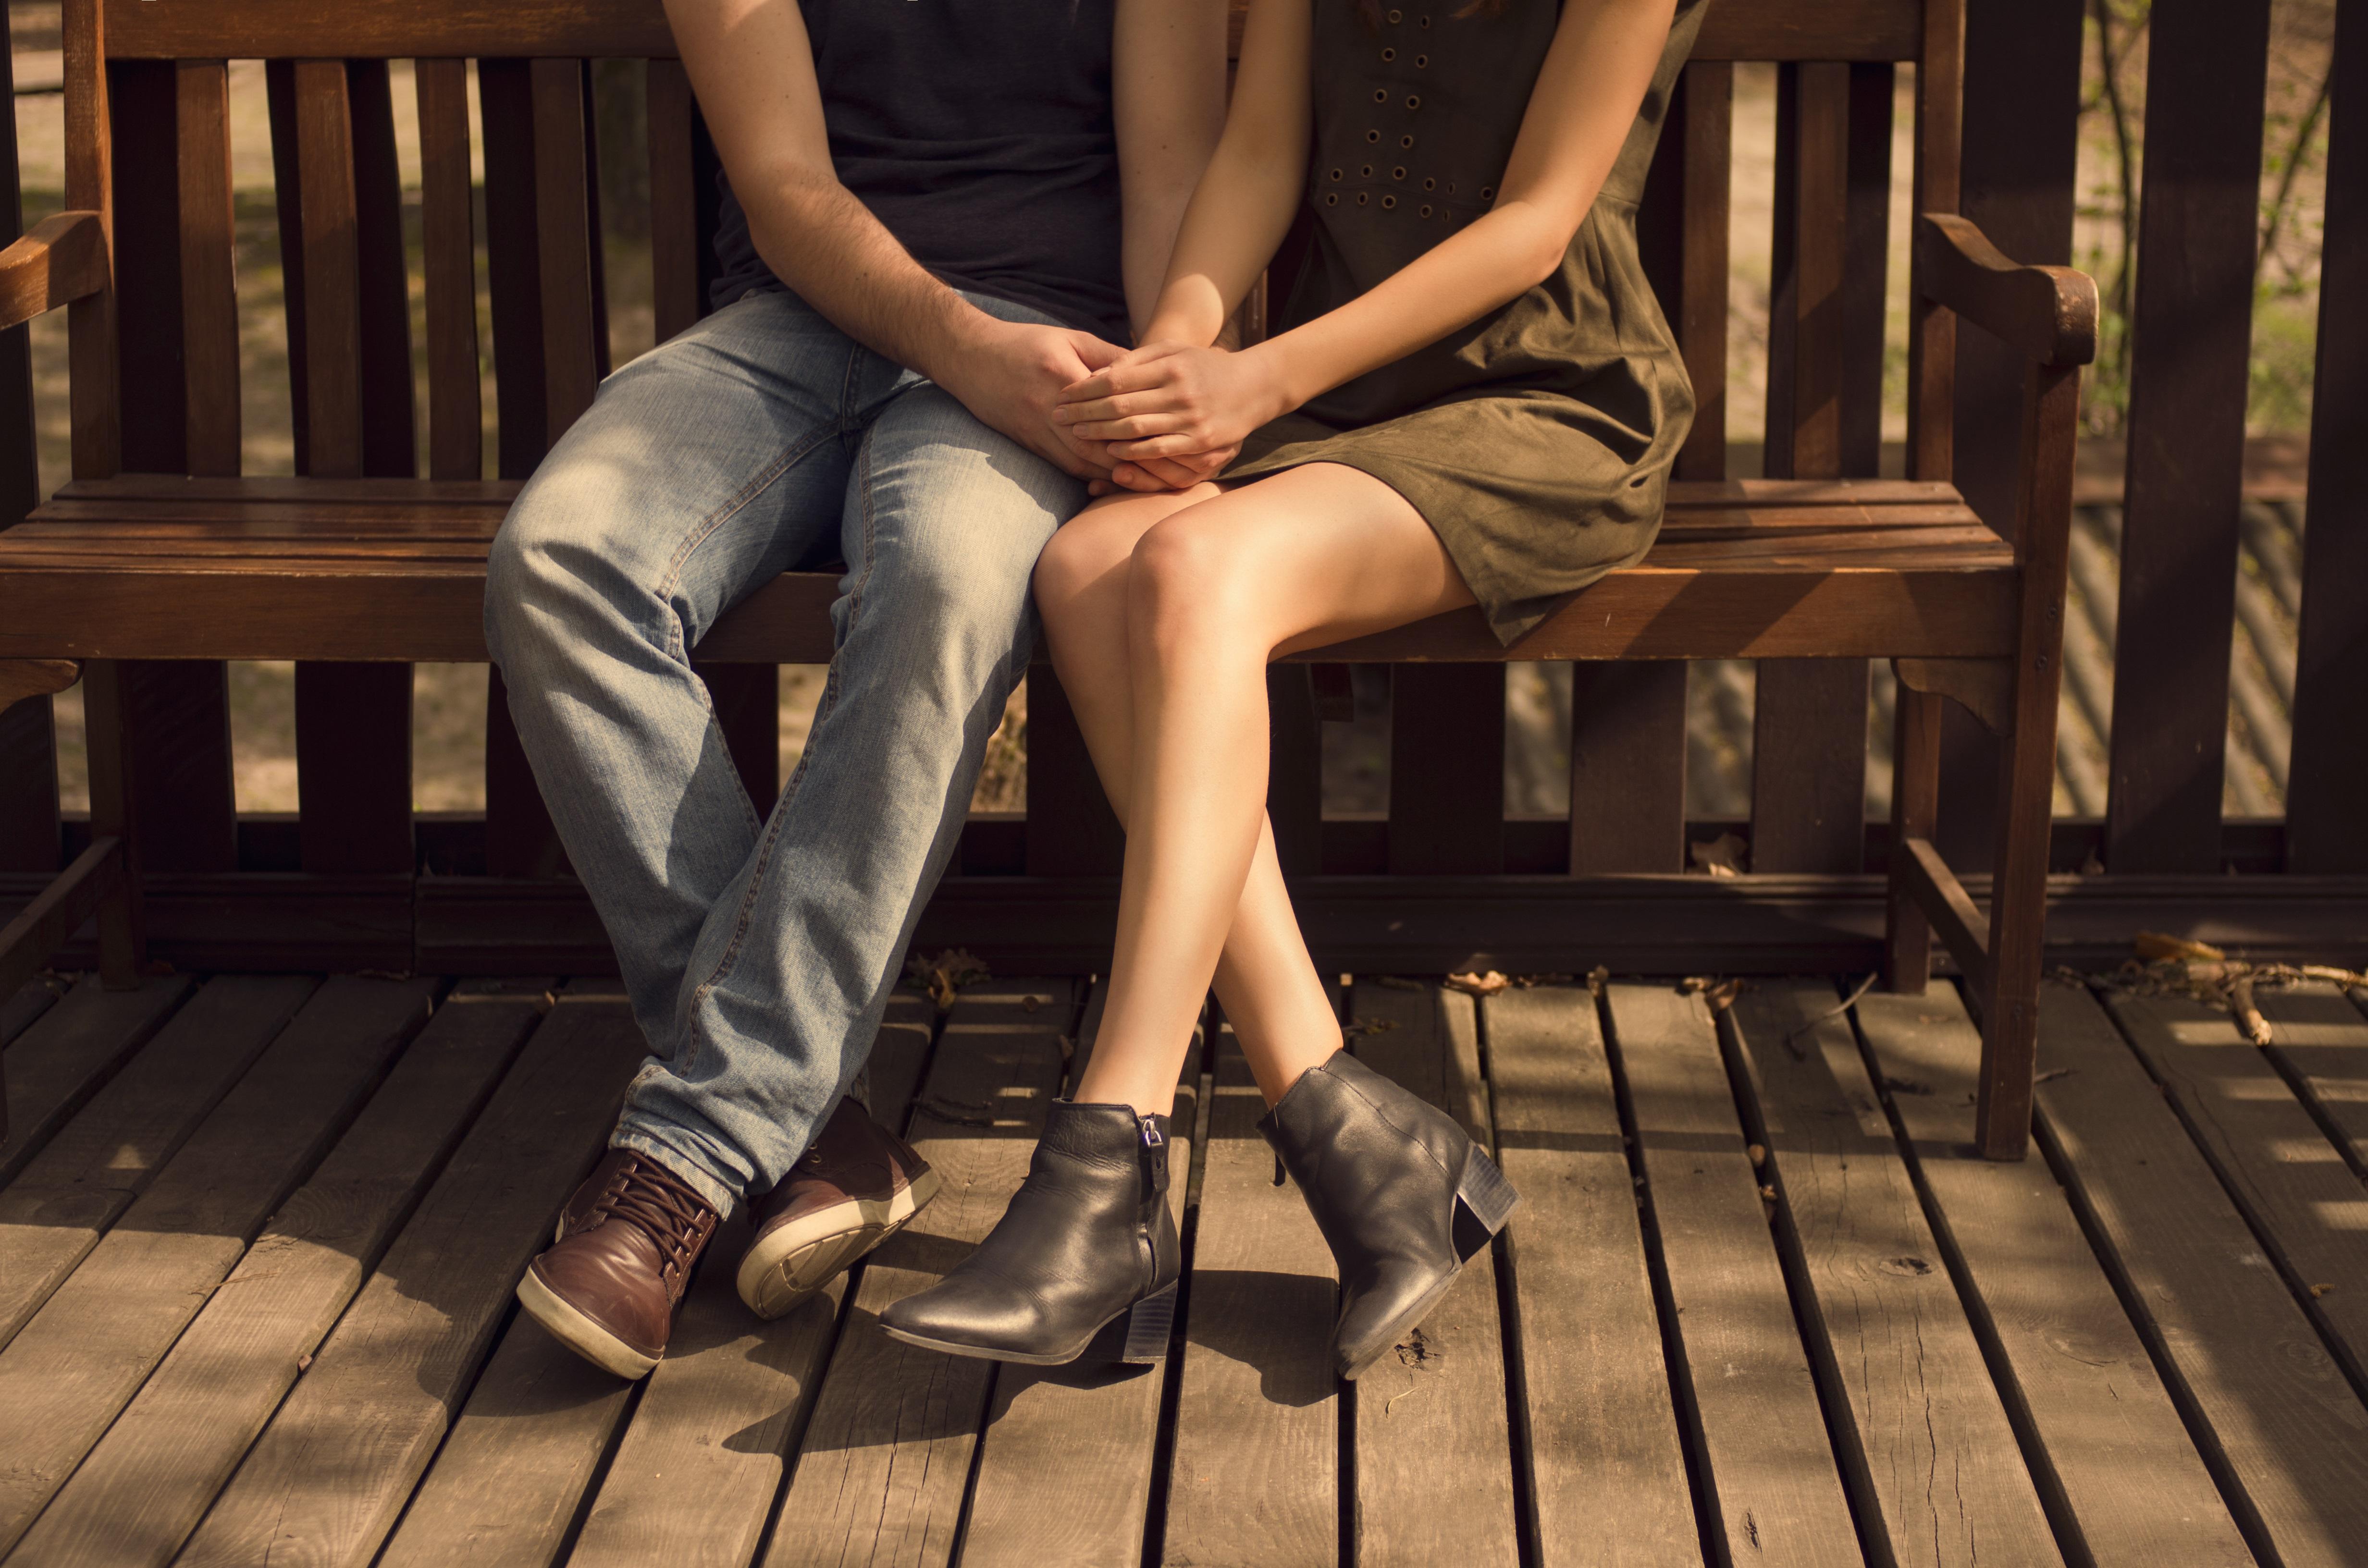 problemas de pareja uruguay